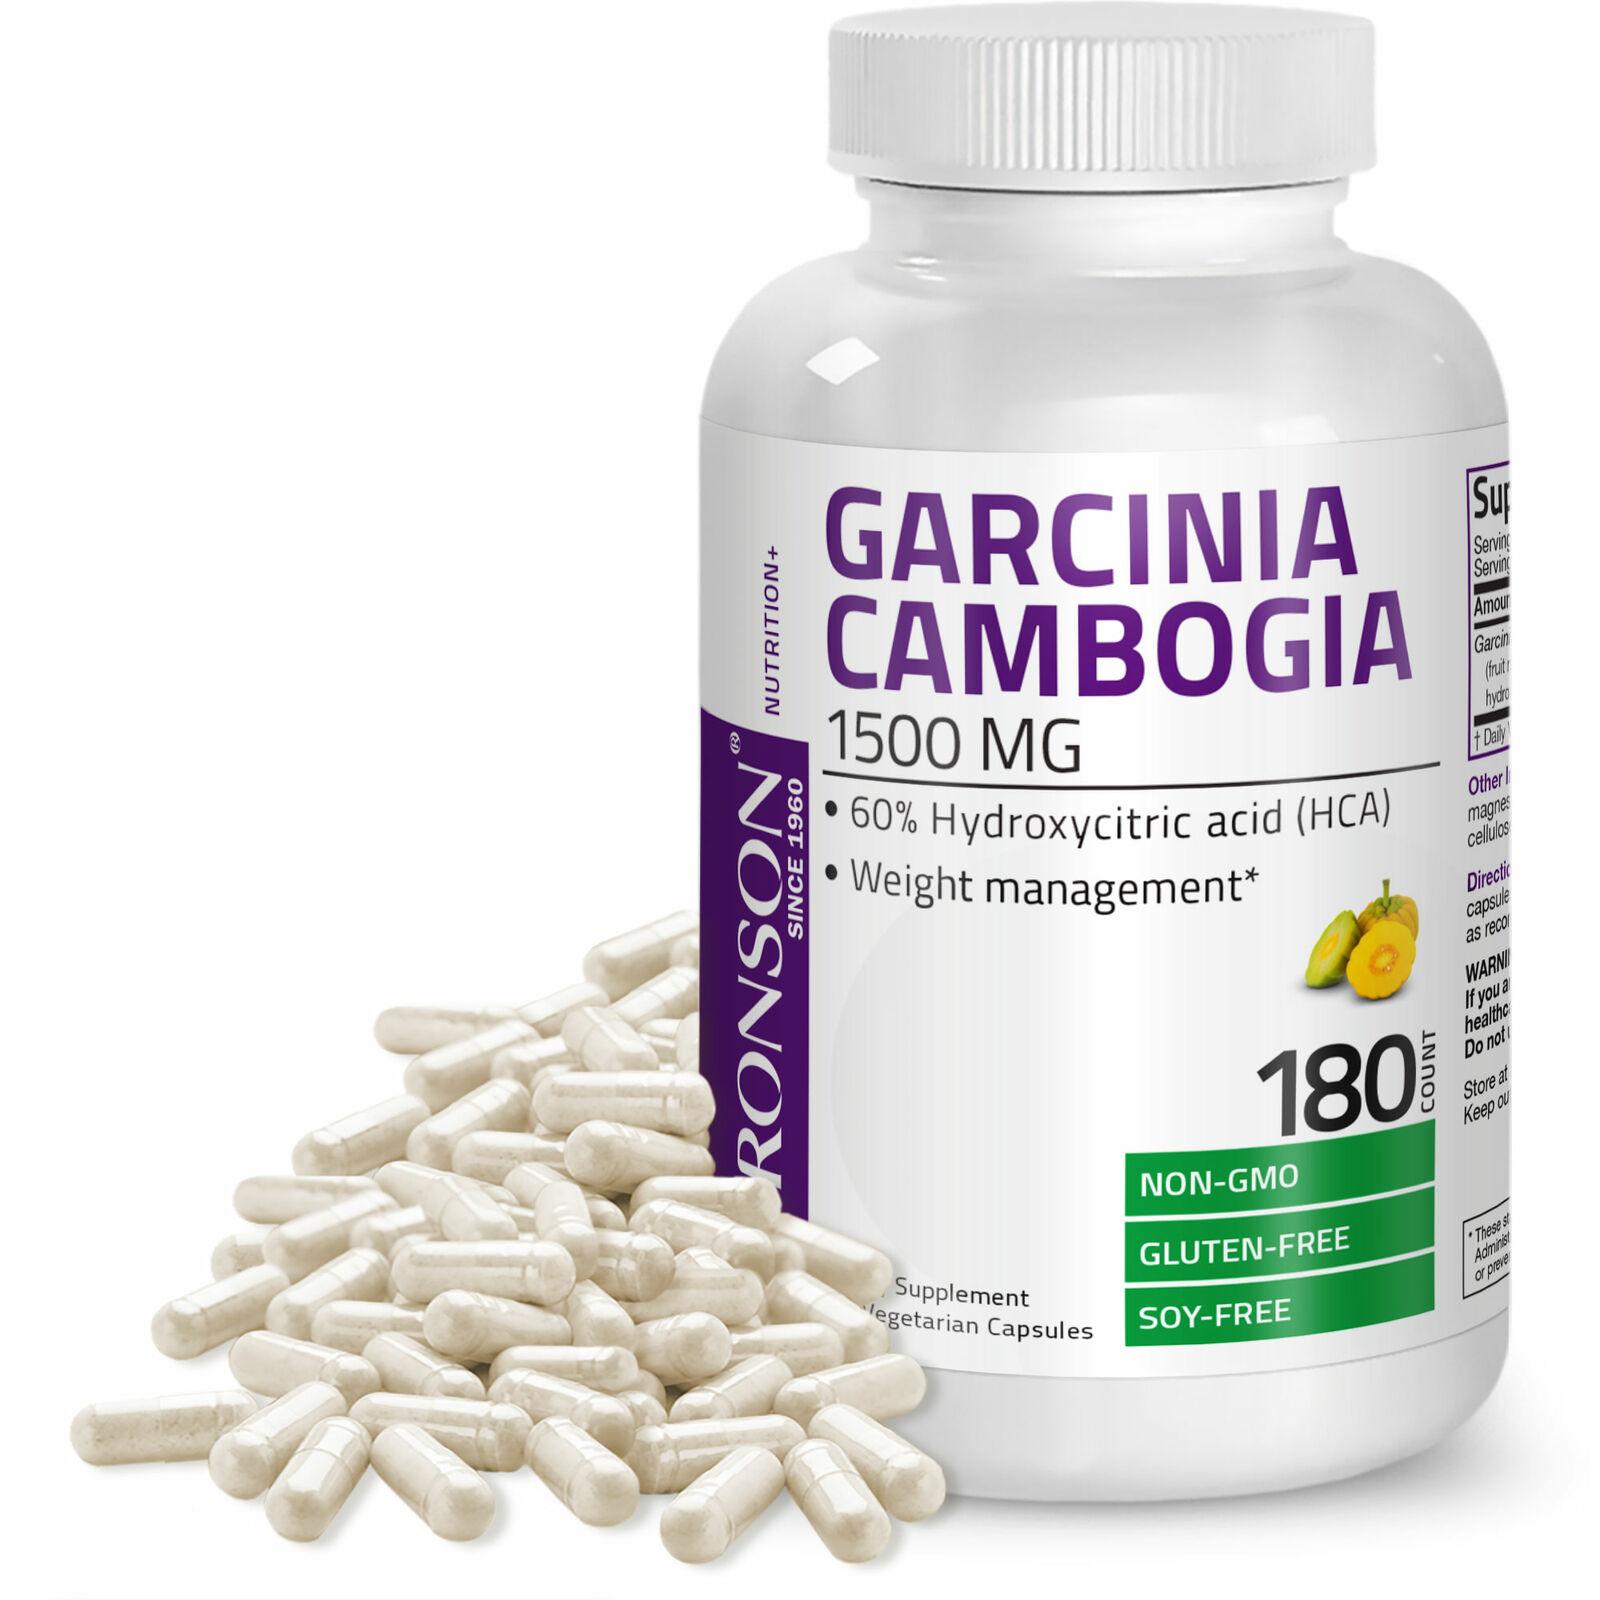 500mg Each Capsules 60/% HCA Garcinia Cambogia Extract Powder Capsules